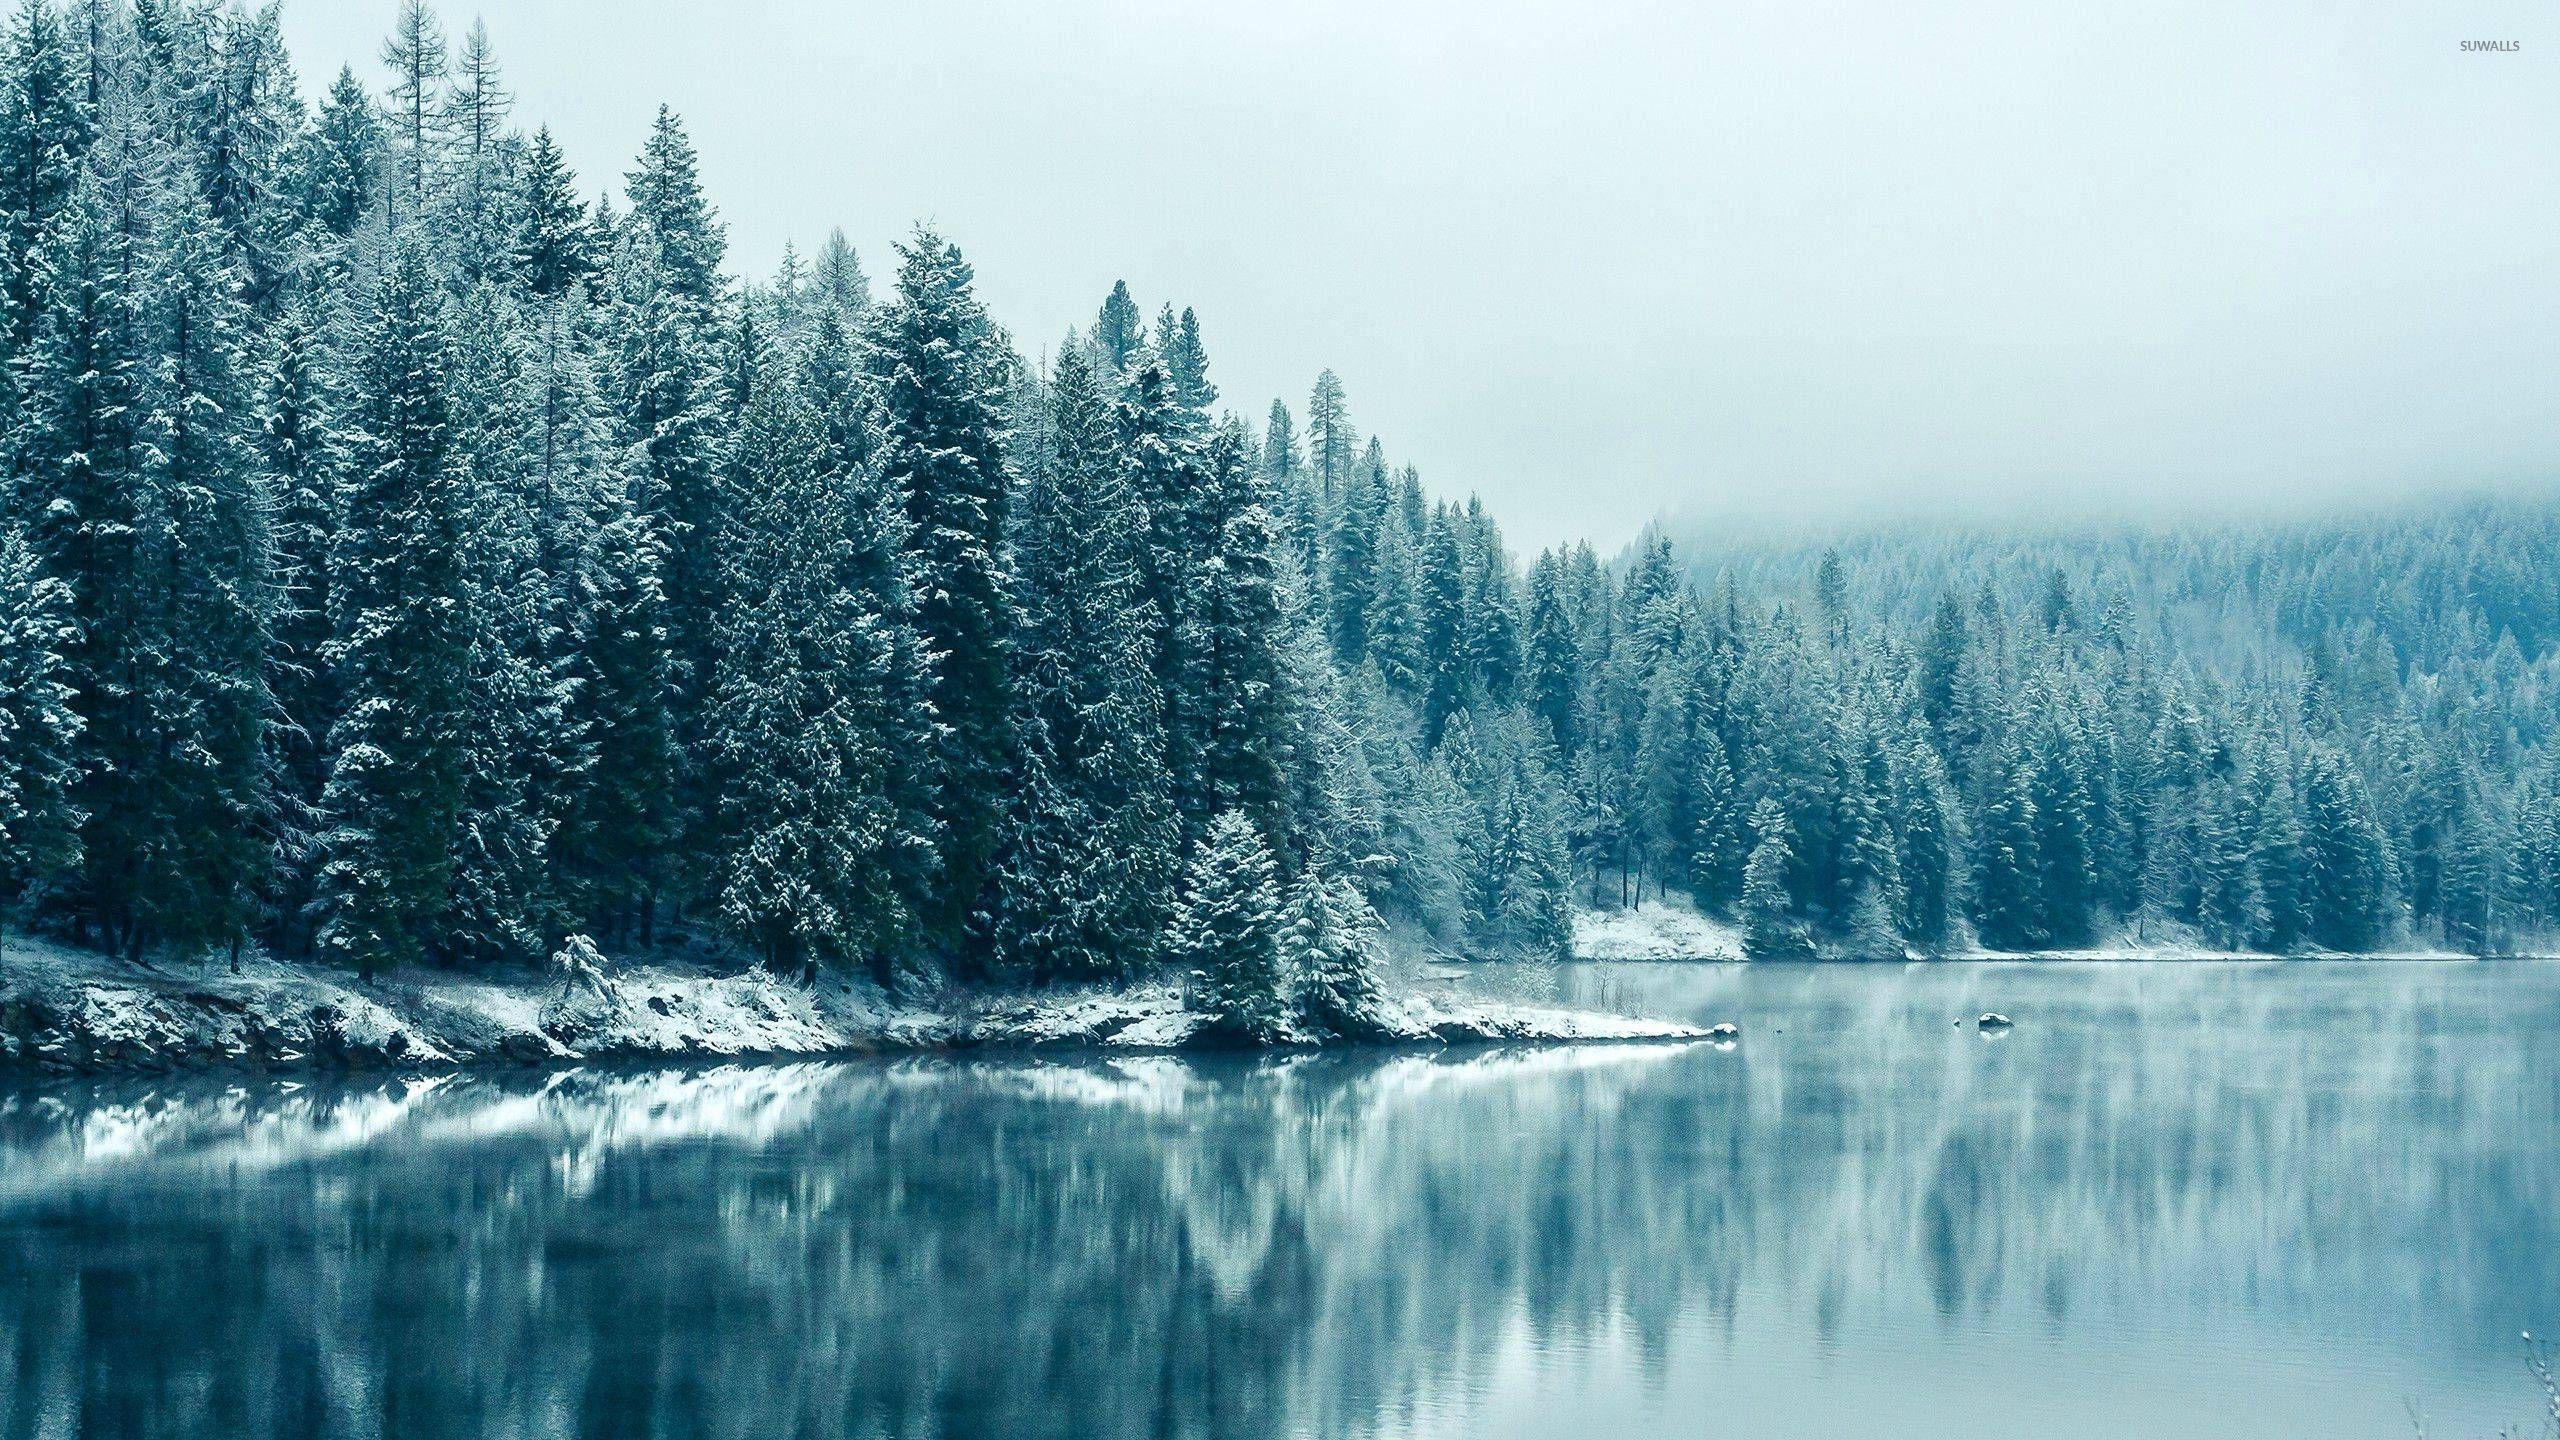 Blue winter lake wallpaper - Nature wallpapers - #29277